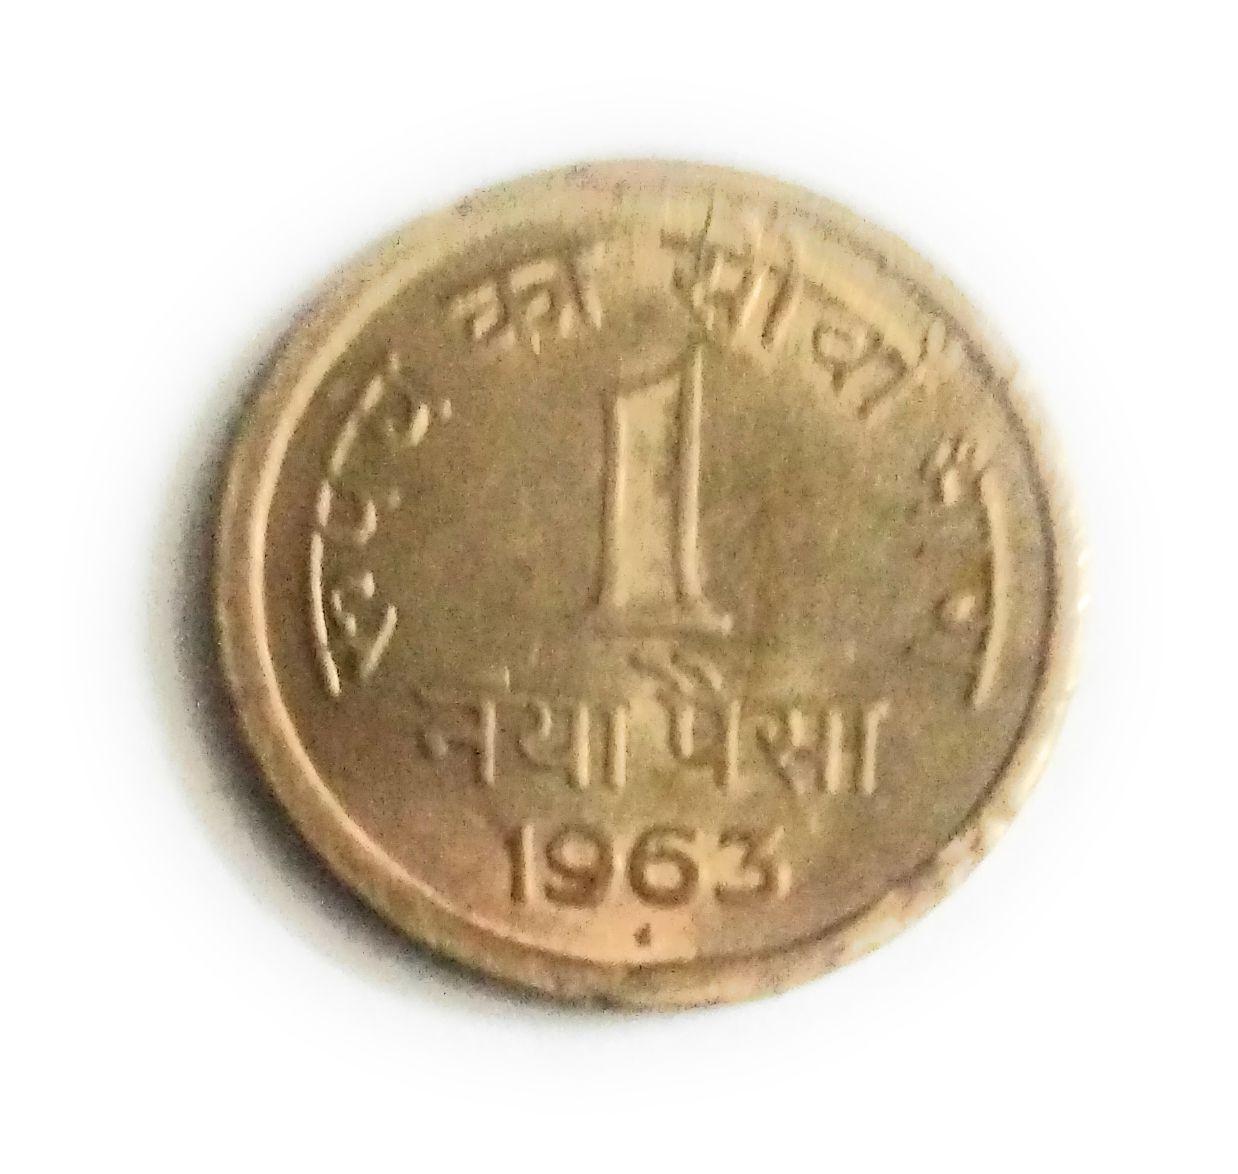 5 paisa coin price